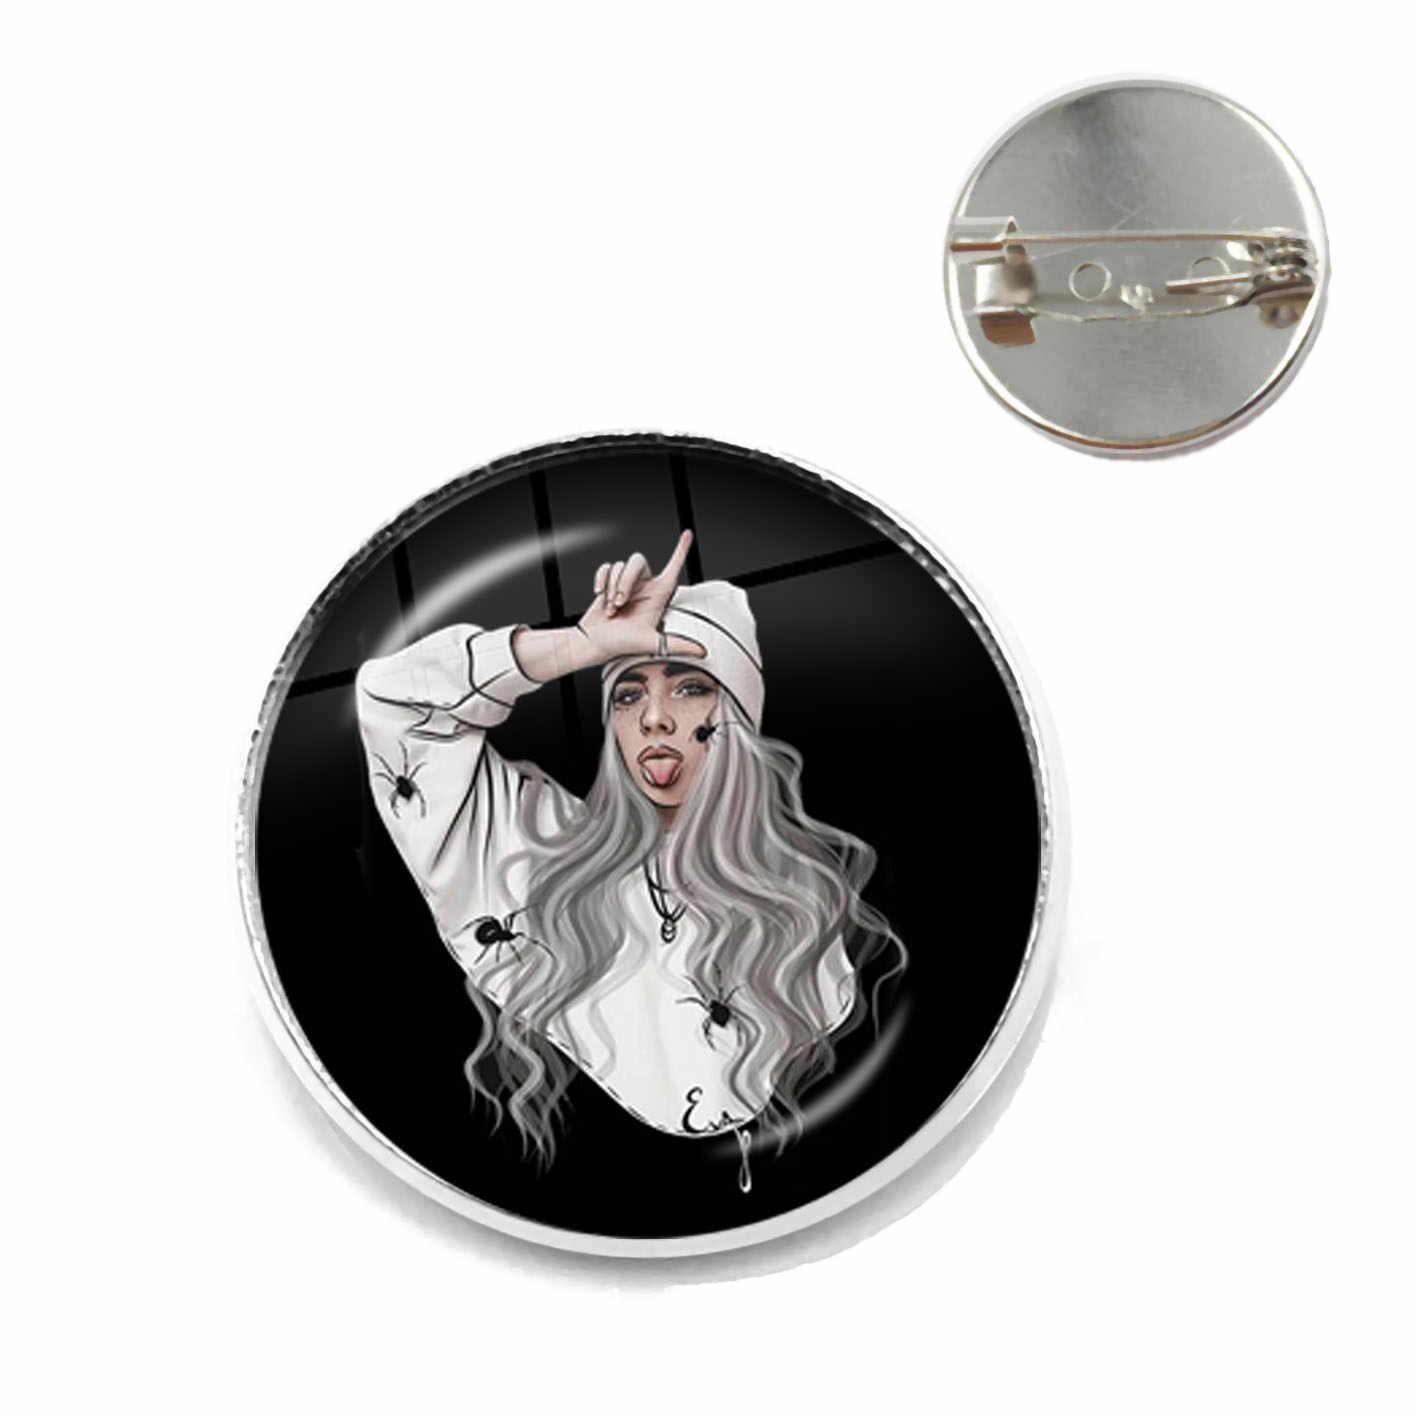 Populer Penyanyi Muda Billie Eilish Bros Gambar Seni Musik Hip-Hop 20 Mm Kaca Cabochon Kerah Pin Perhiasan untuk Para Penggemar Musik hadiah